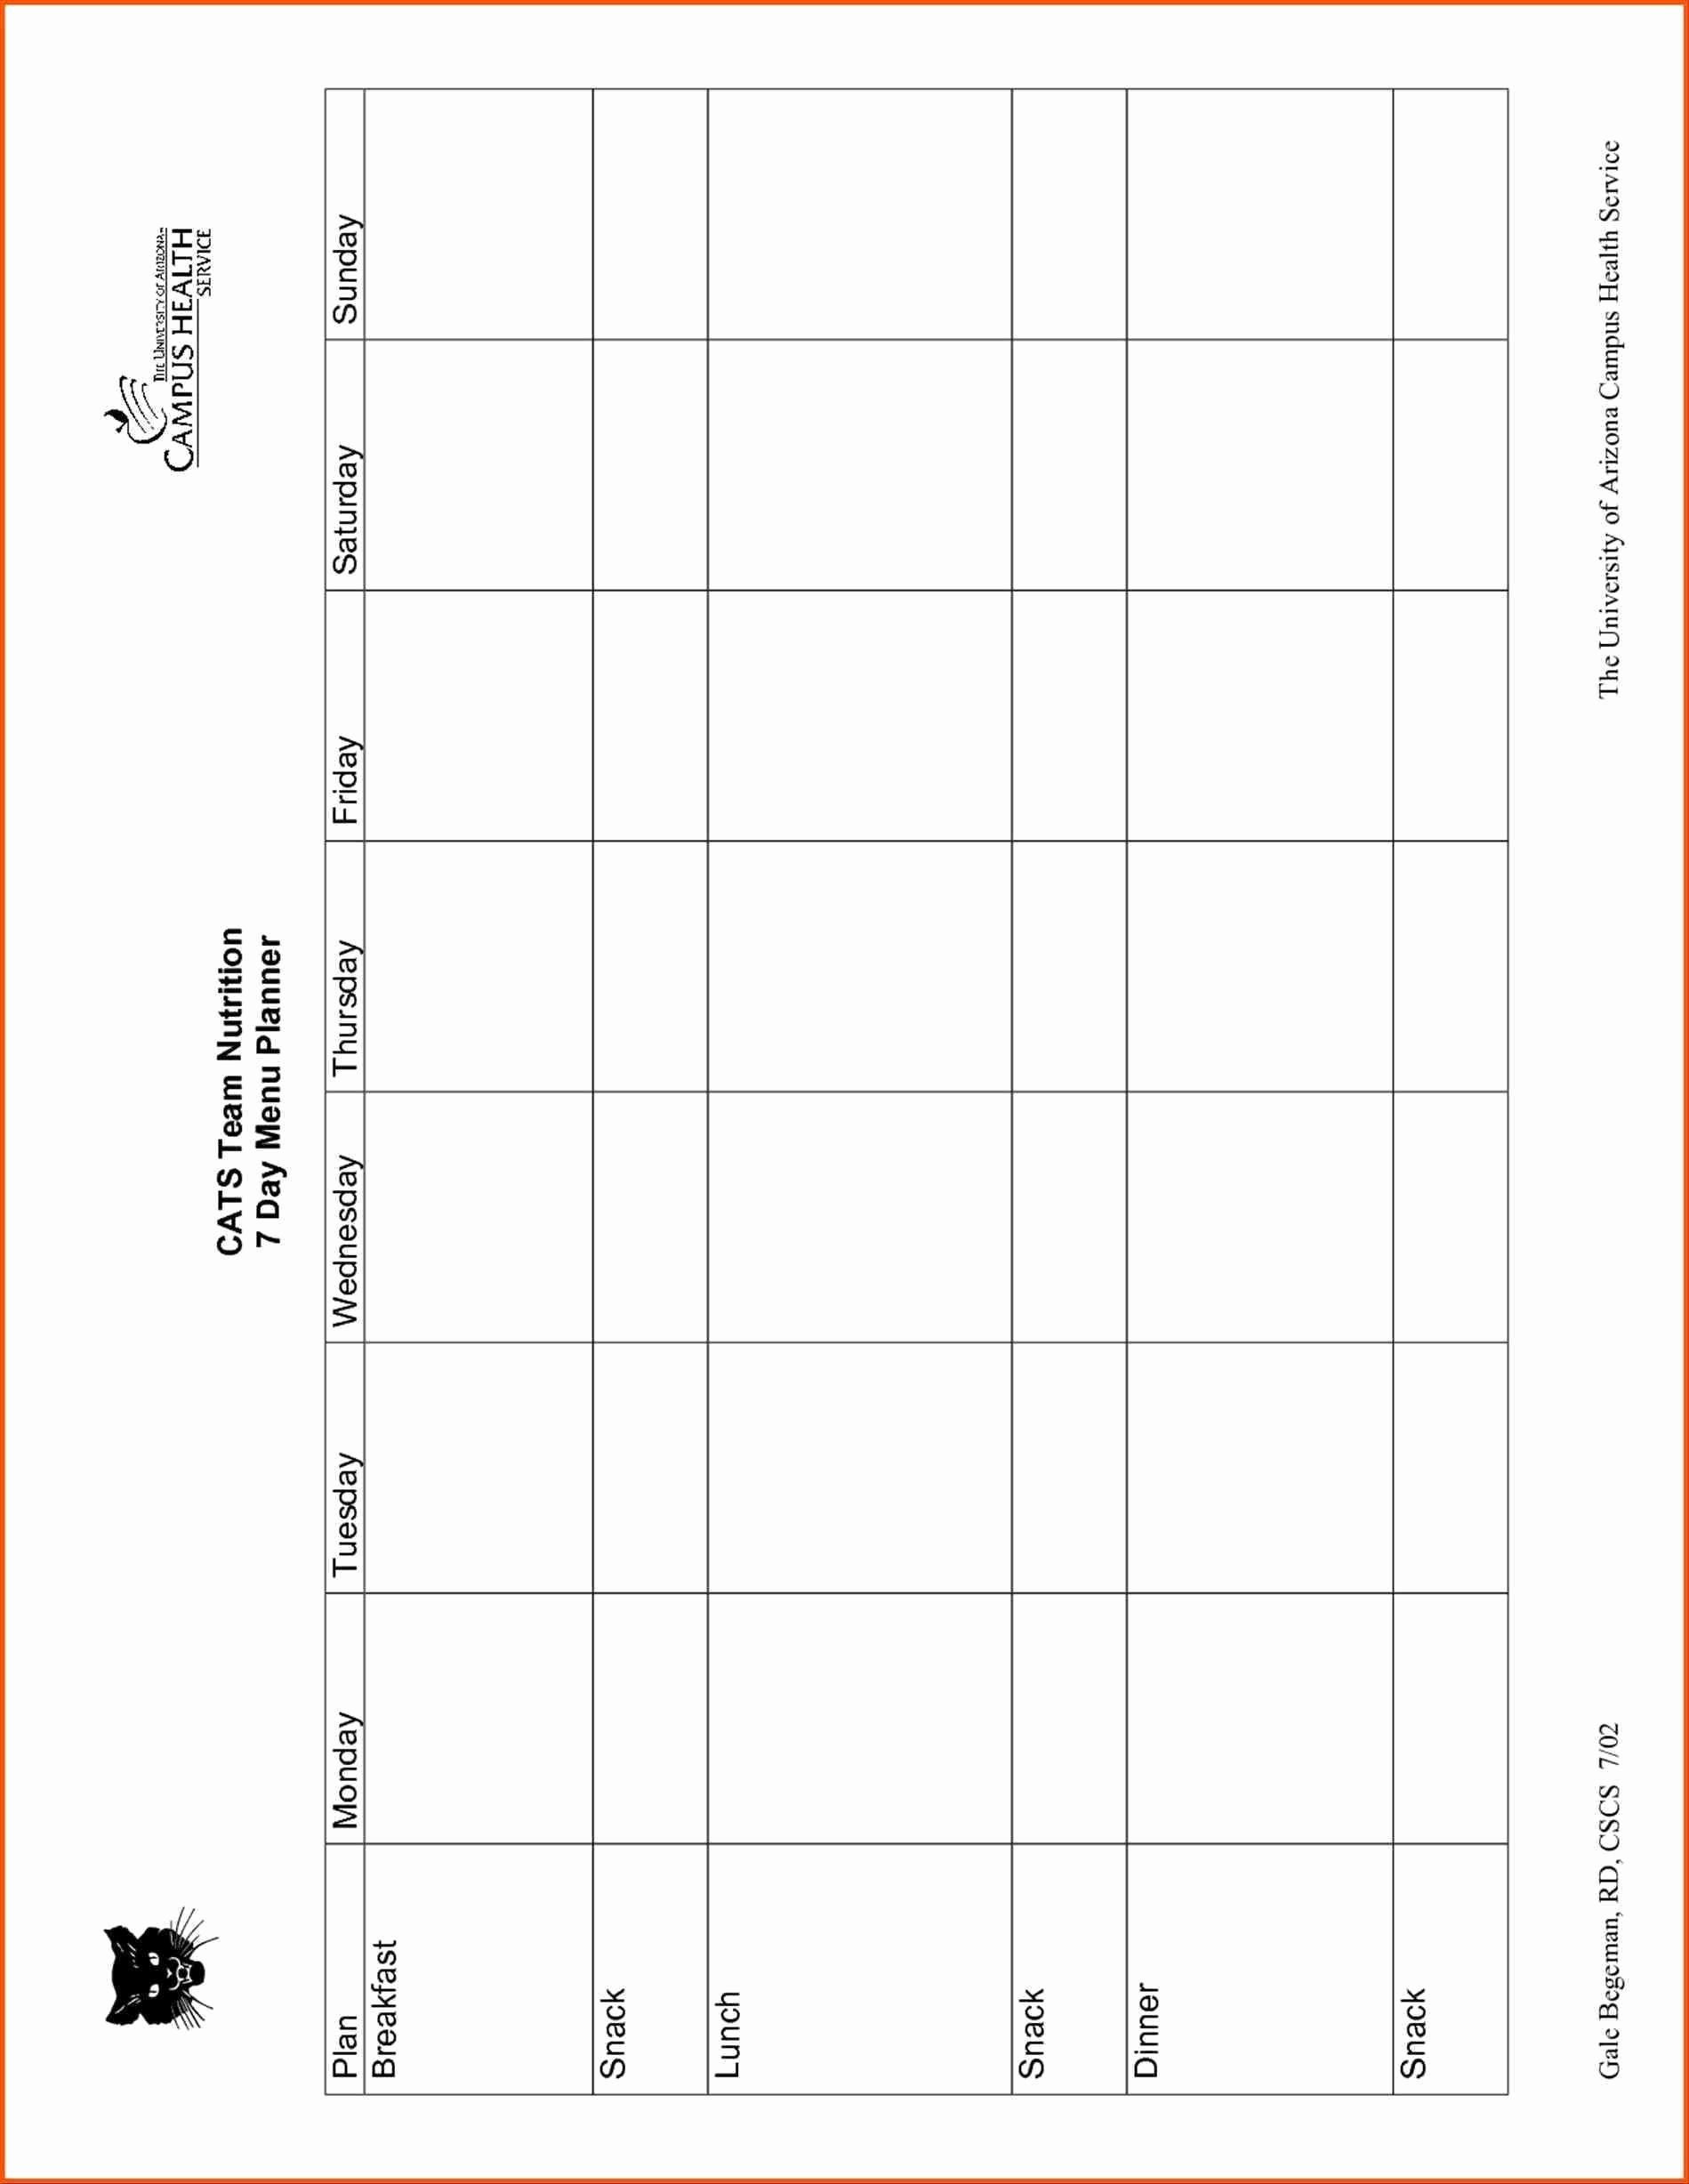 Free Printable Daycare Menus (68+ Images In Collection) Page 1 - Free Printable Daycare Menus